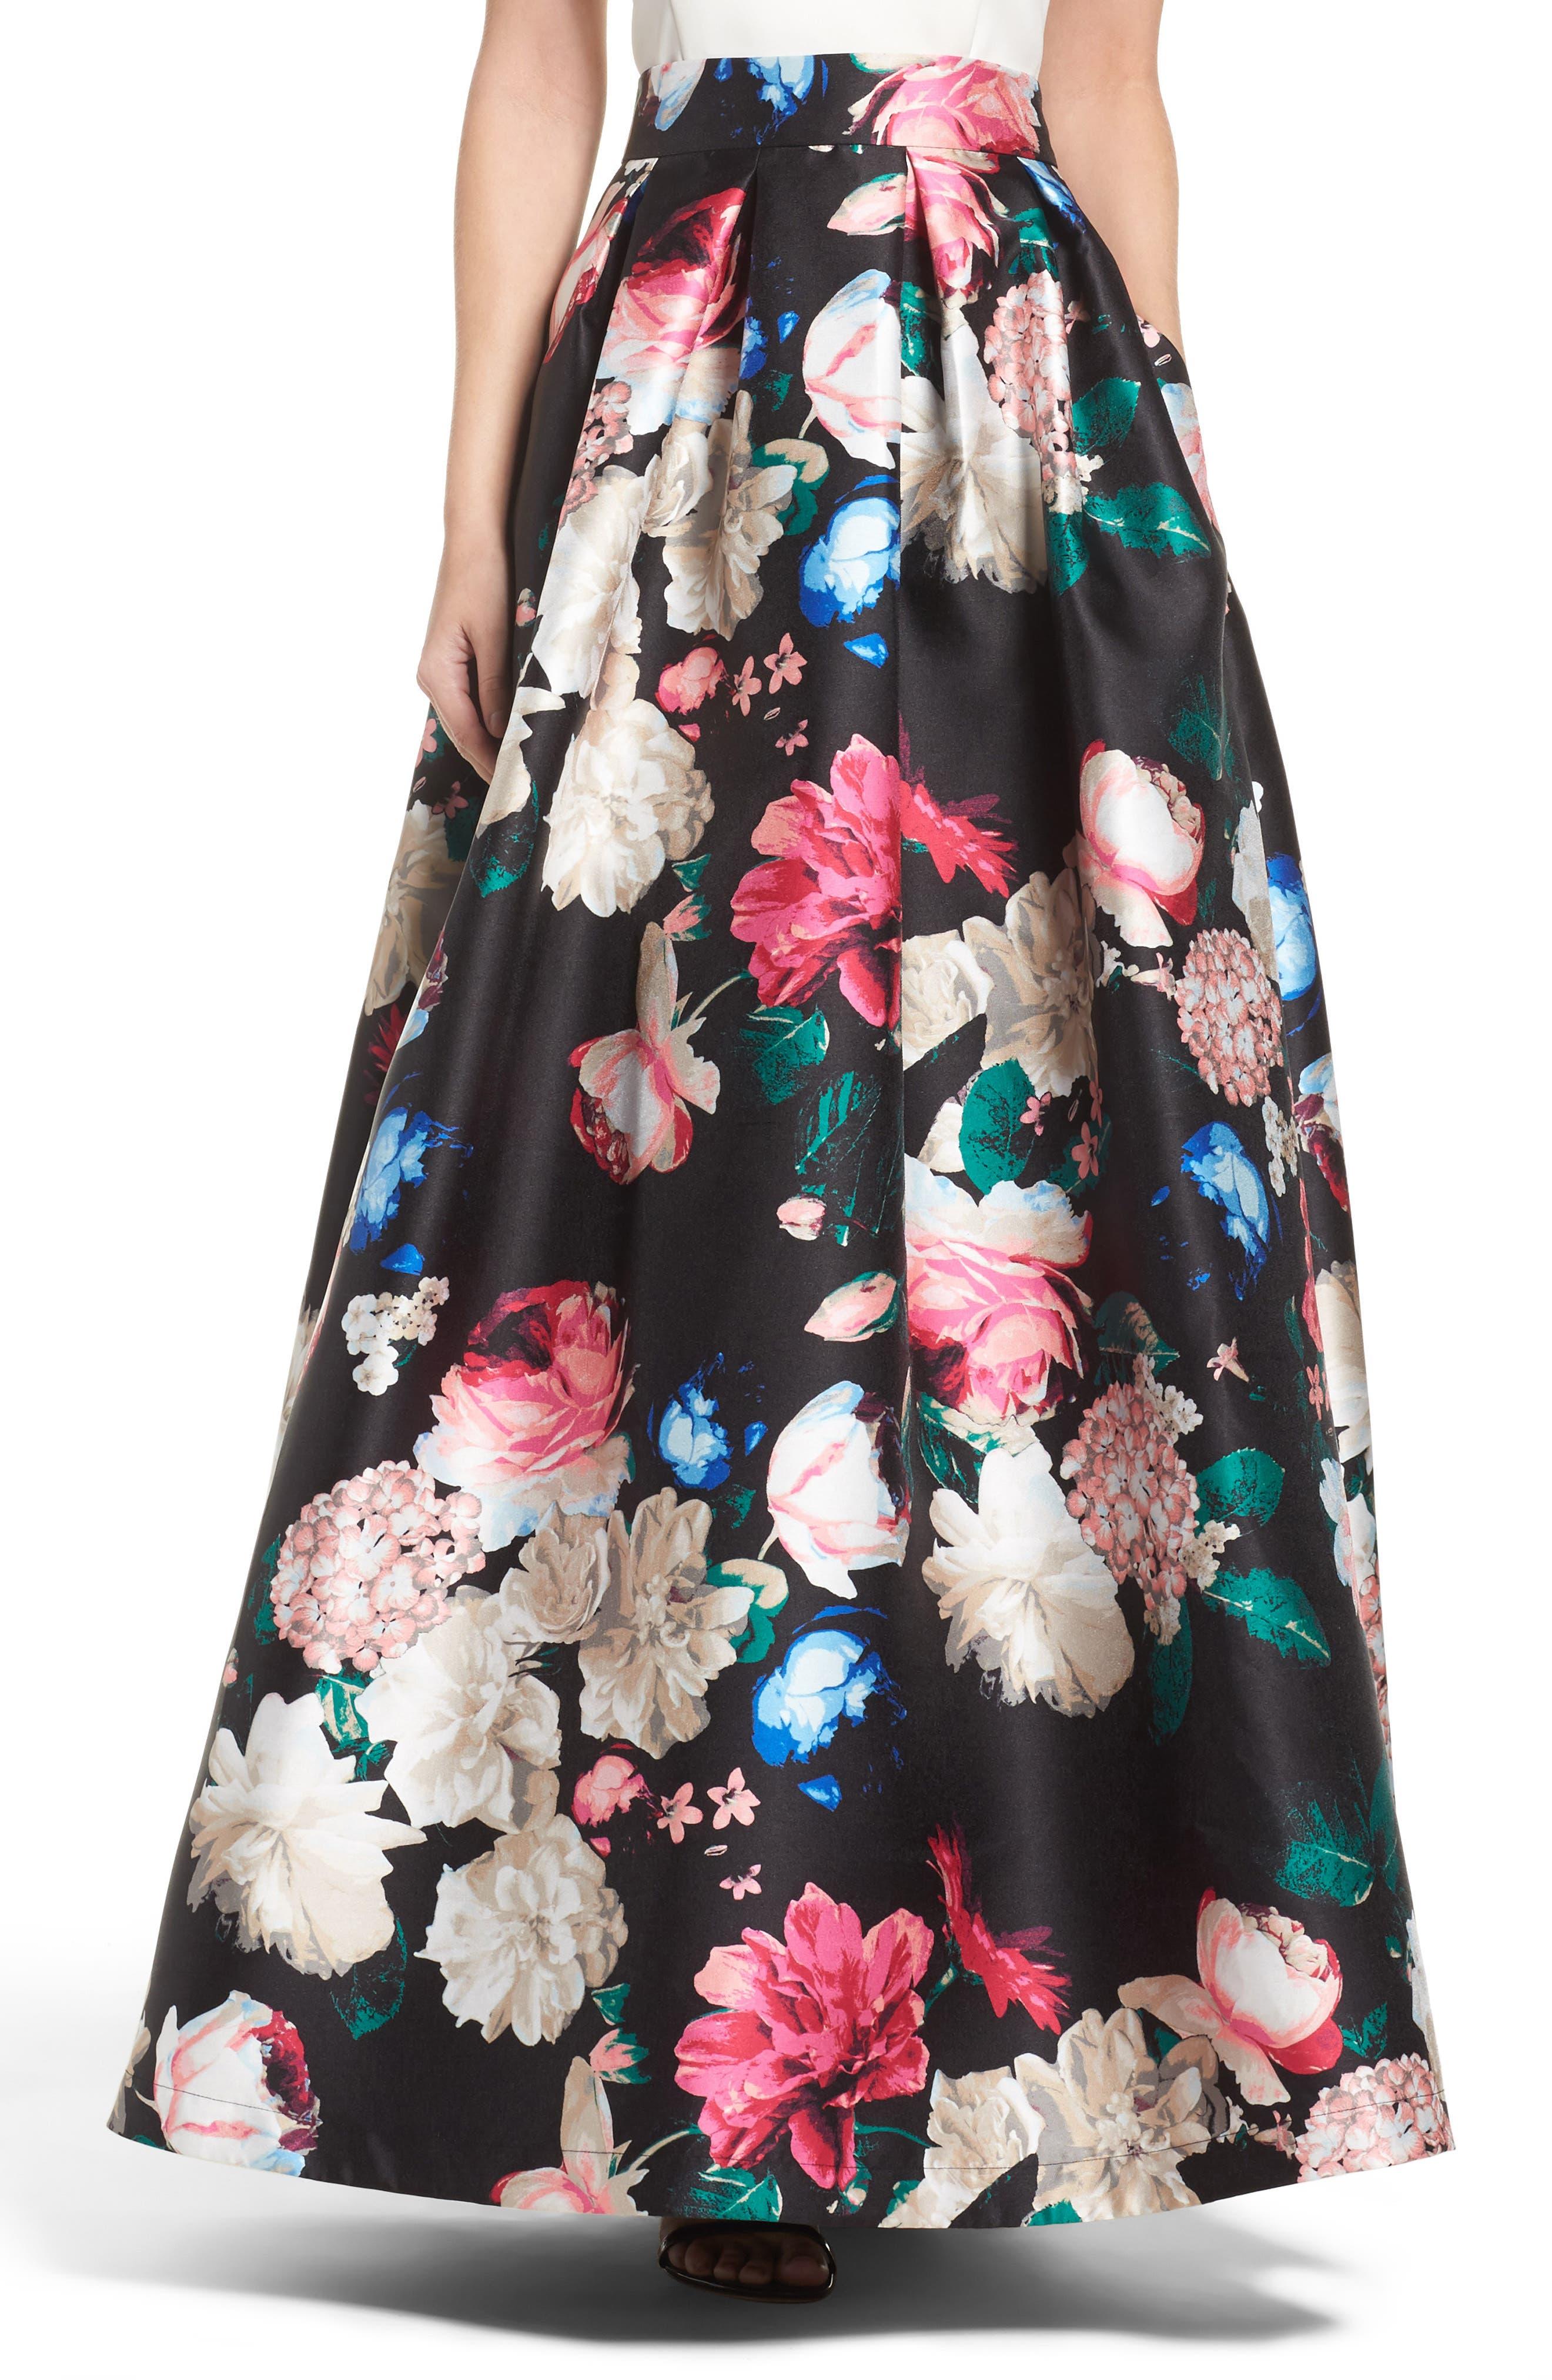 Faille Ball Skirt,                             Main thumbnail 1, color,                             Black/ Pink